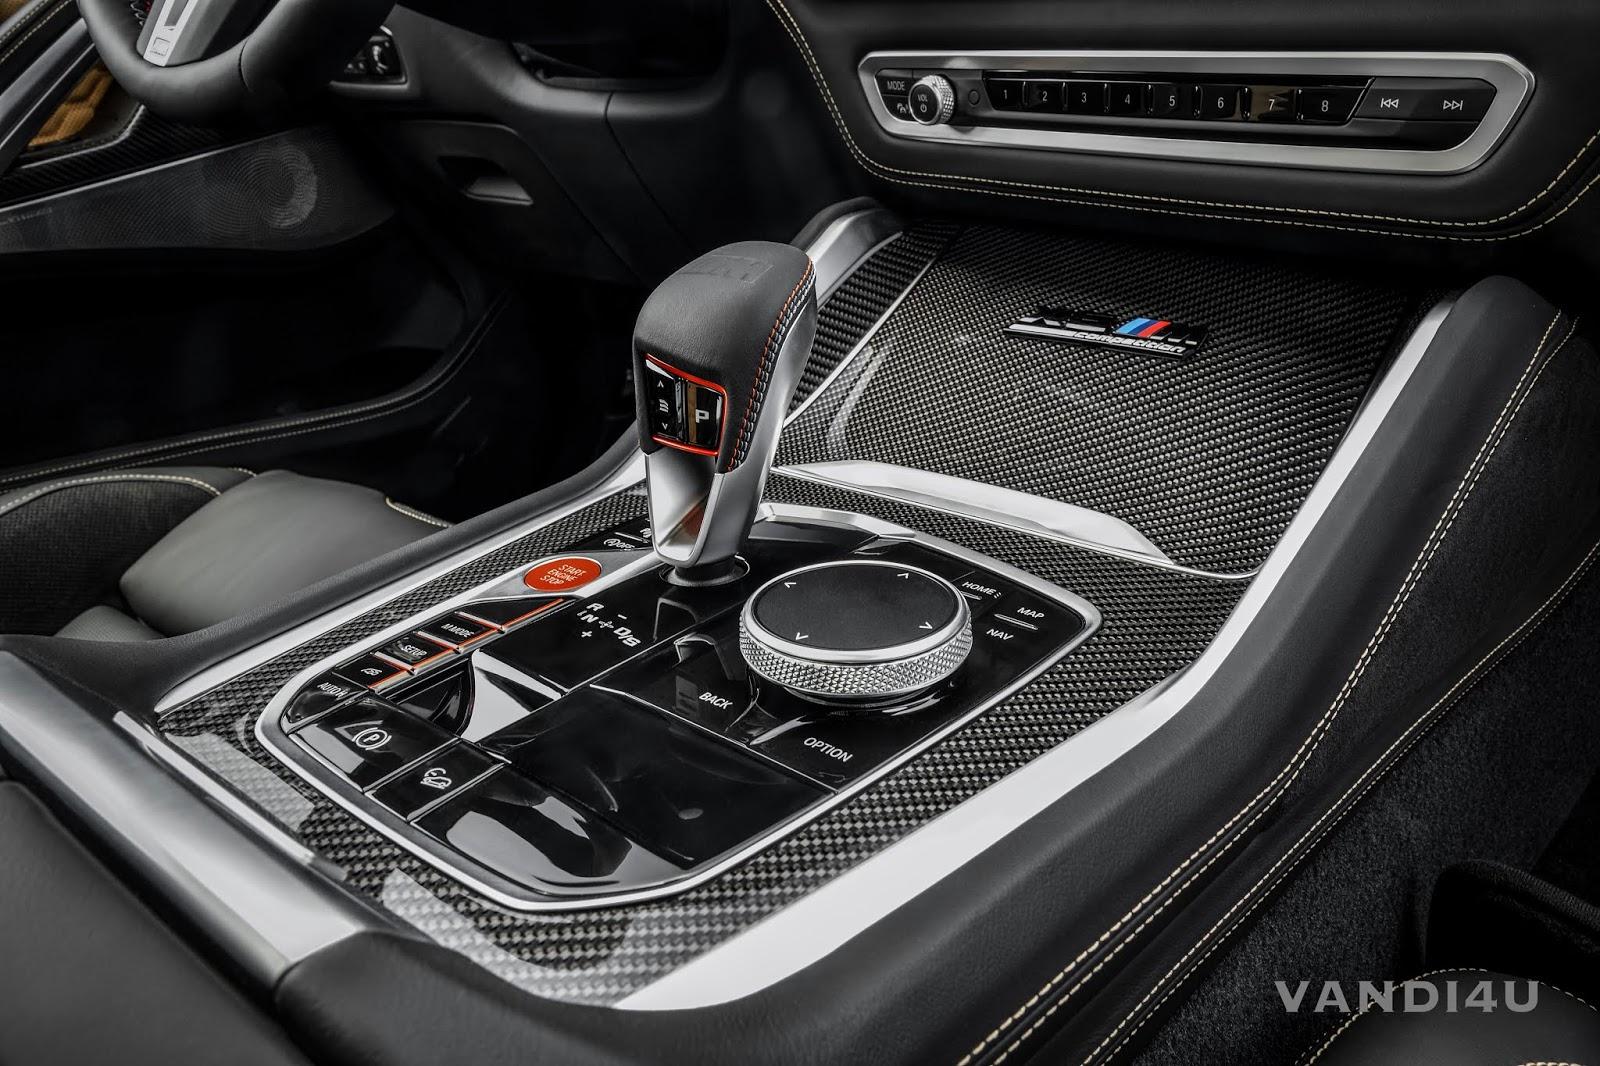 2020 BMW X6 M revealed: Top 5 things to know | VANDI4U